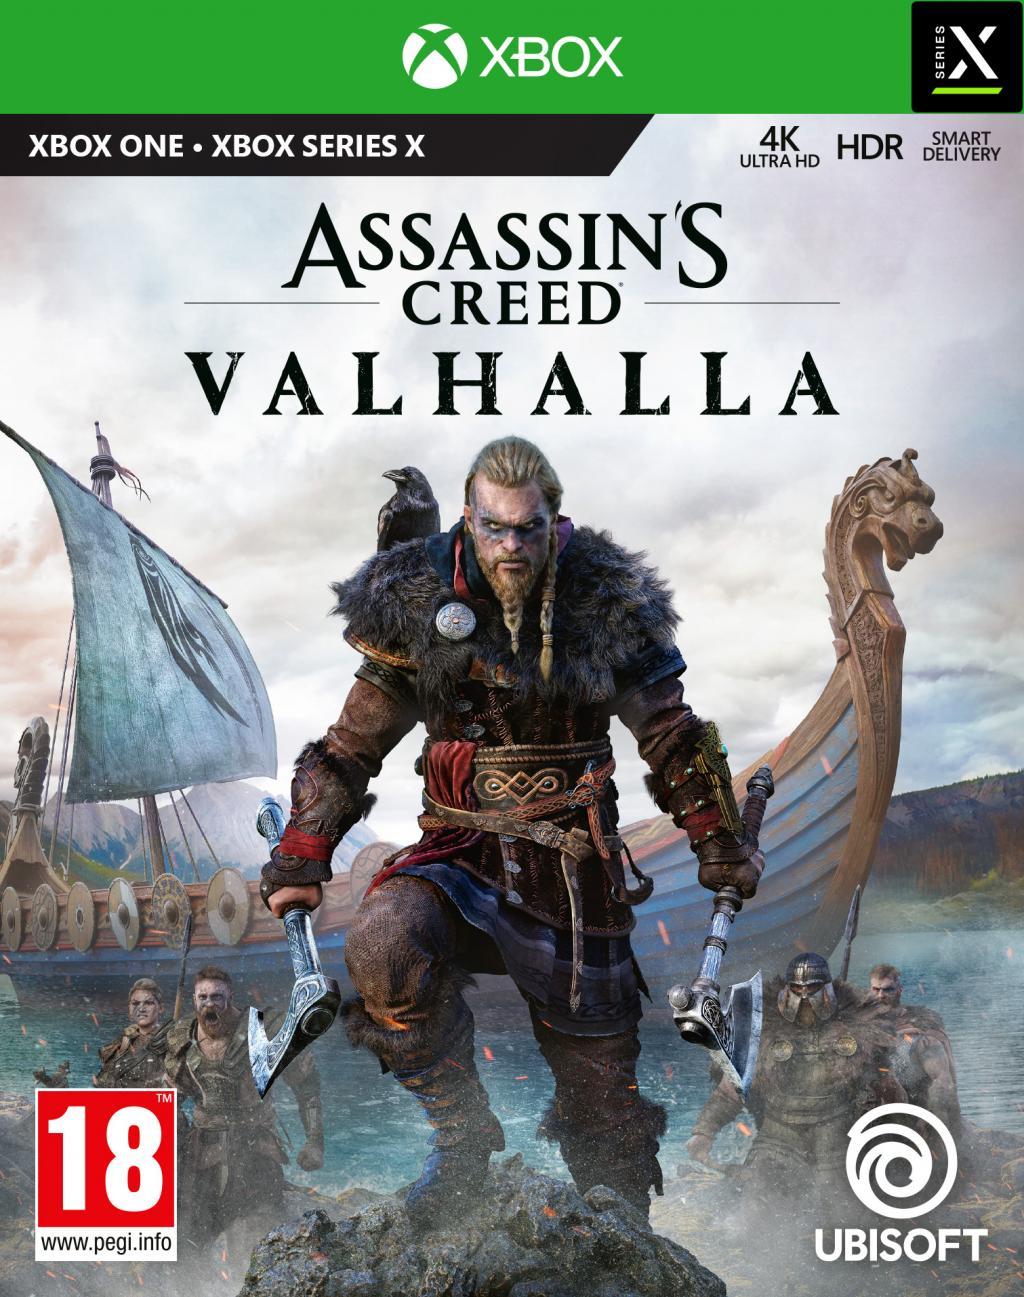 Assassin's Creed Valhalla XBONE & XBSX_1